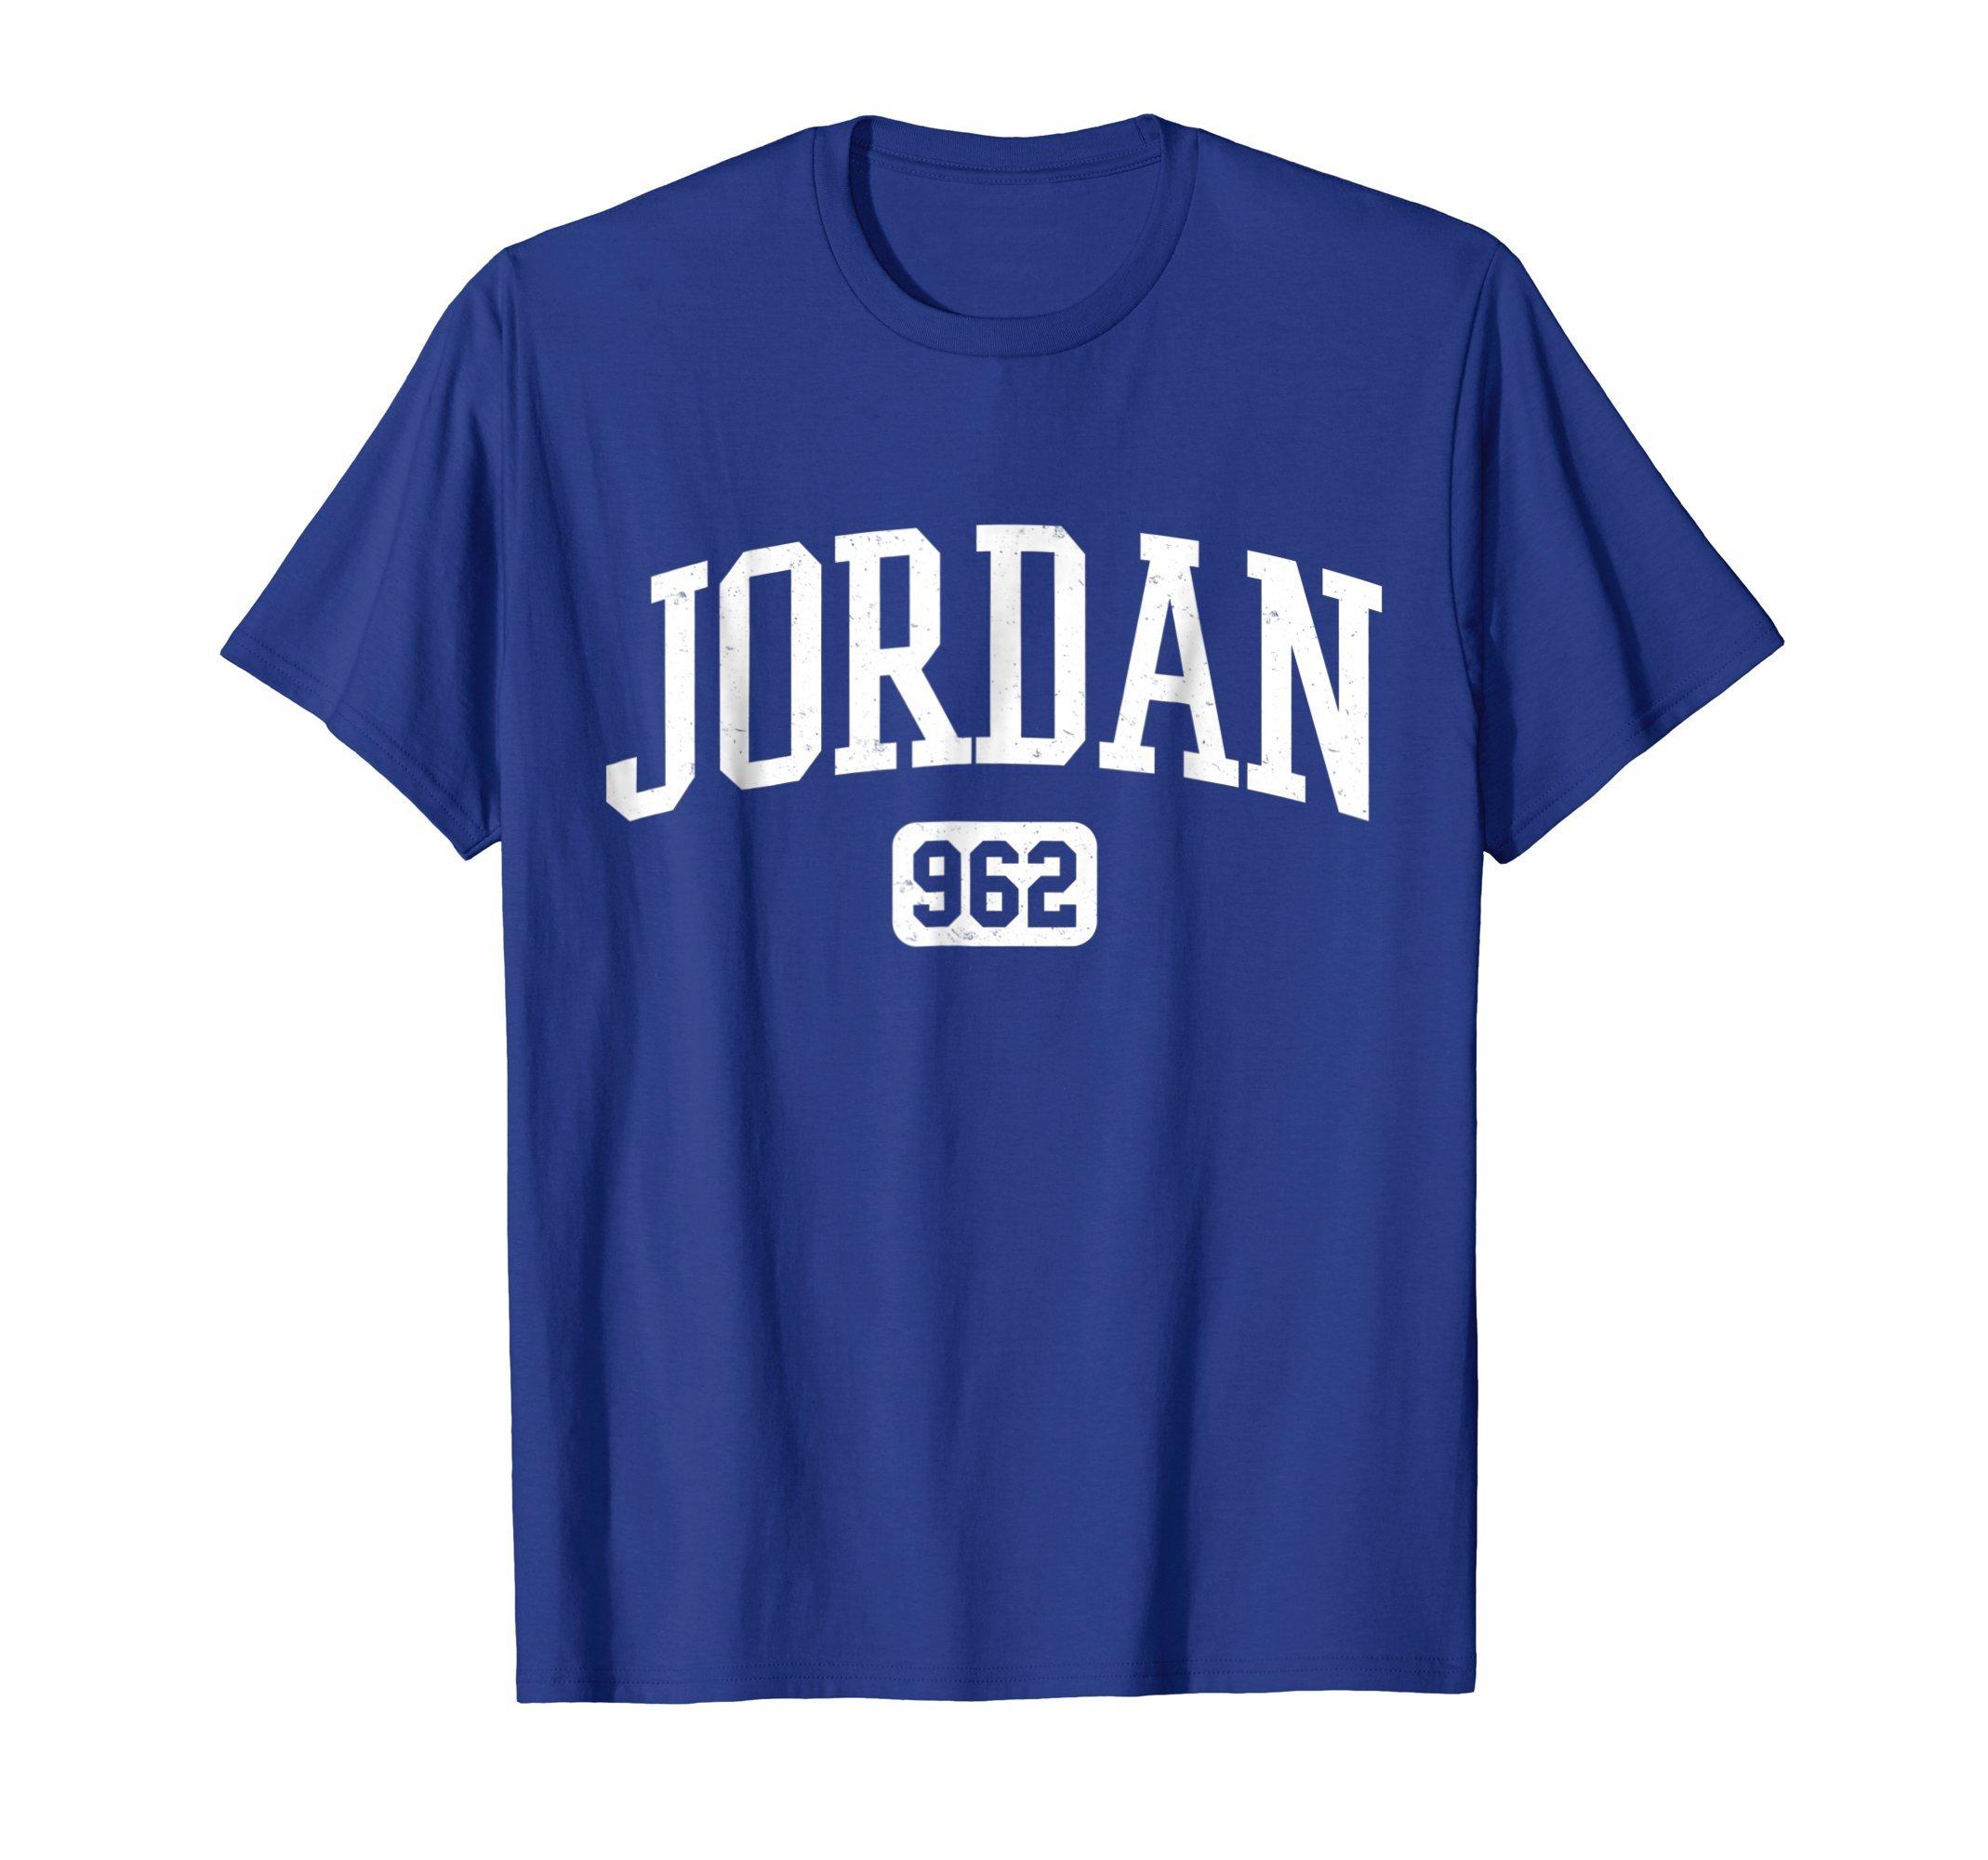 Mens 962 Country Area Code Jordan Jordanian Pride T-Shirt Medium Royal Blue